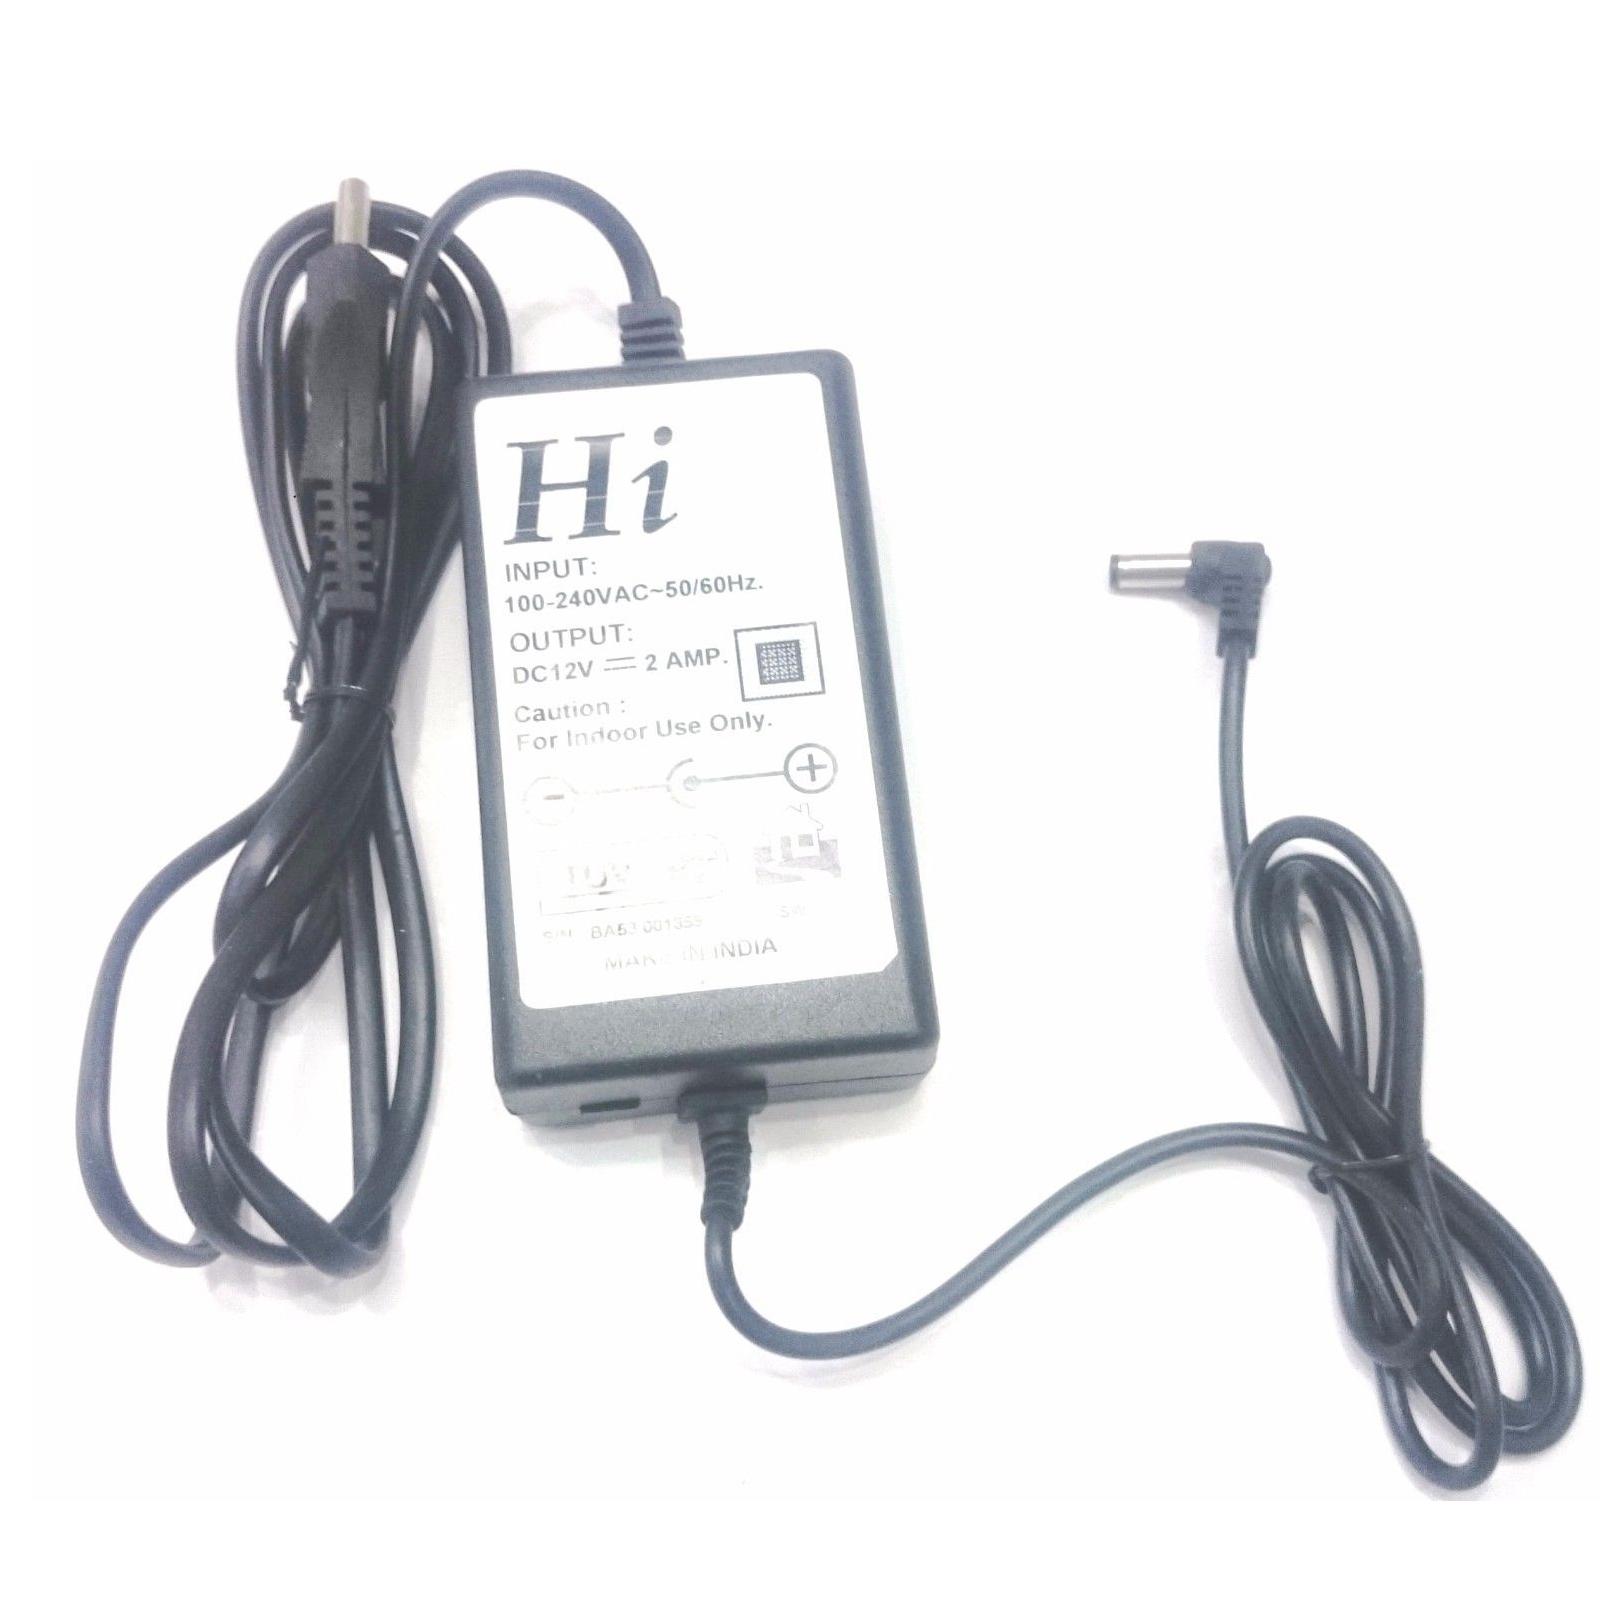 Buy 12v 2a Dc Power Supply Ac Adaptor Smps Led Strip Cctv Home